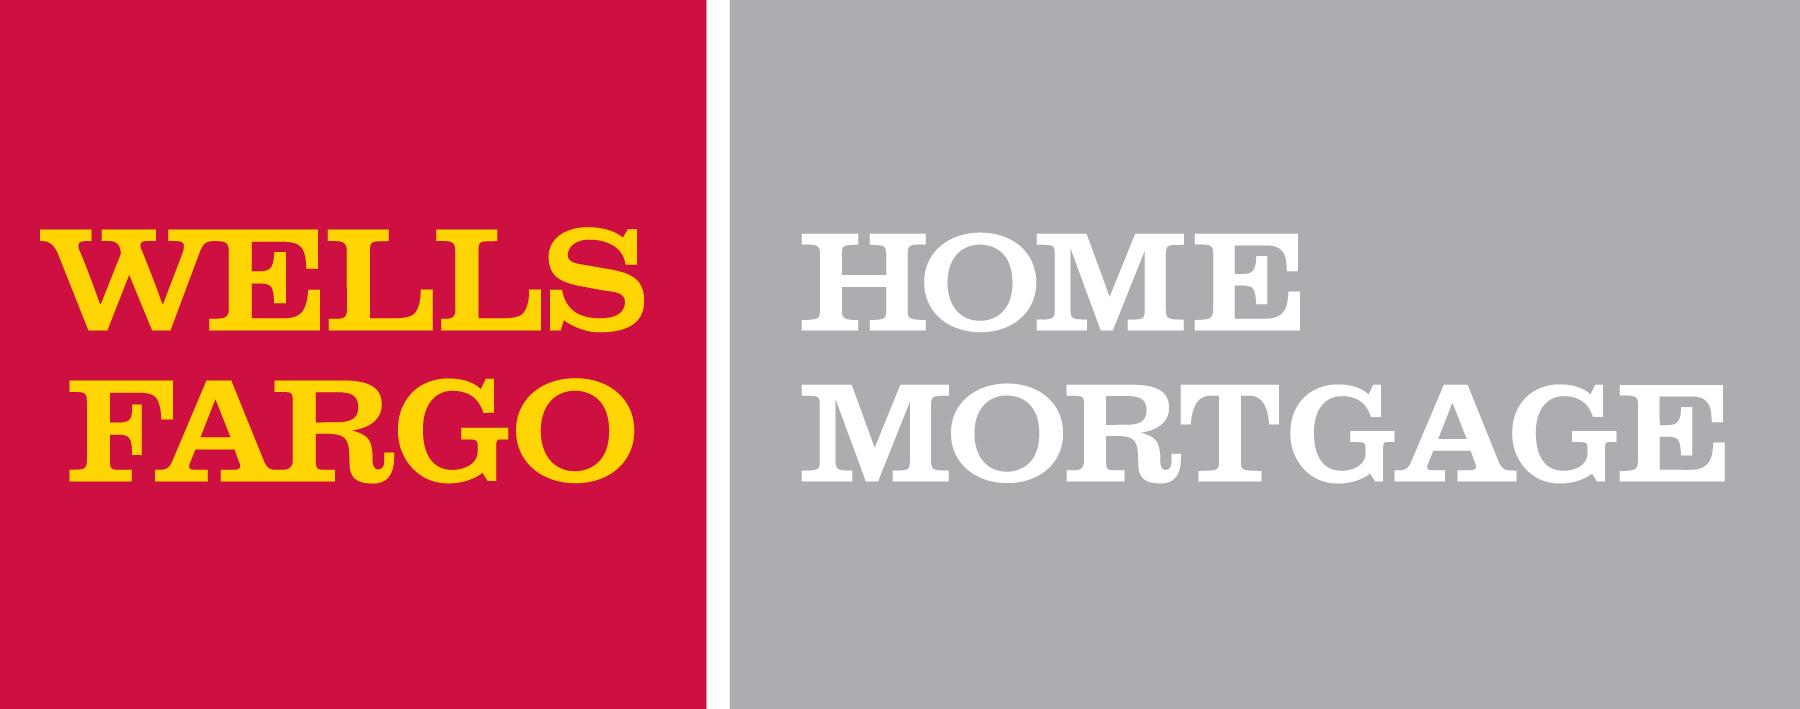 Wells Fargo Home Morte 2019 Khts Santa Clarita And Garden Show Shows In California